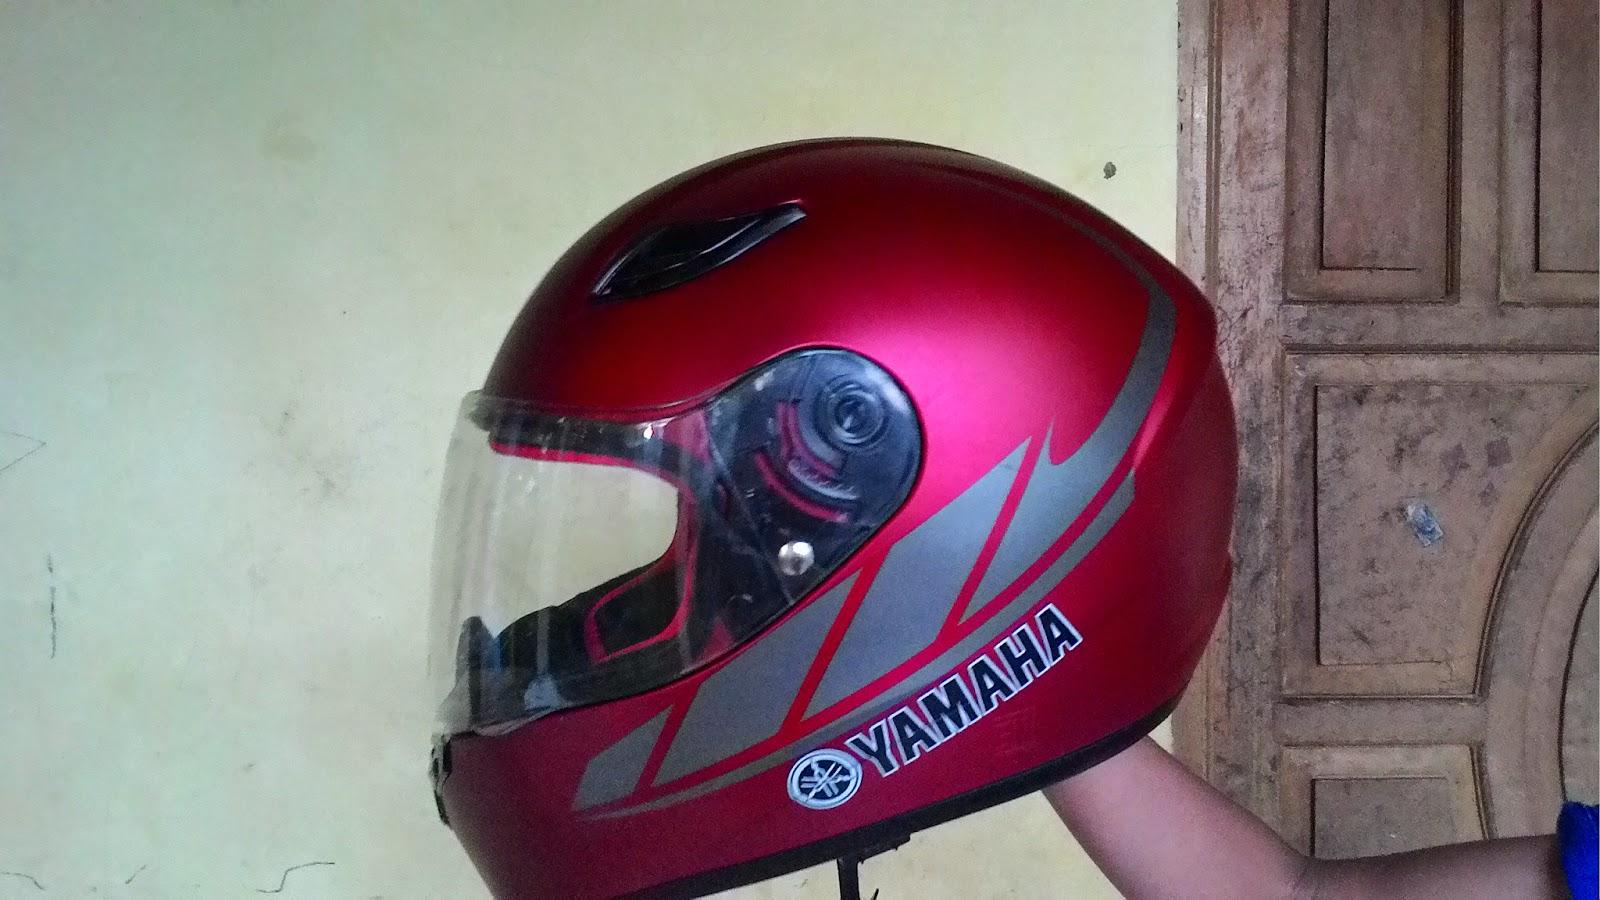 Koleksi 44 Modifikasi Helm Yamaha Full Face Terbaik Kempoul Motor Visor Flat Costum Vixion Suka Roda Dua Via Vesiculigerous63rssingcom New